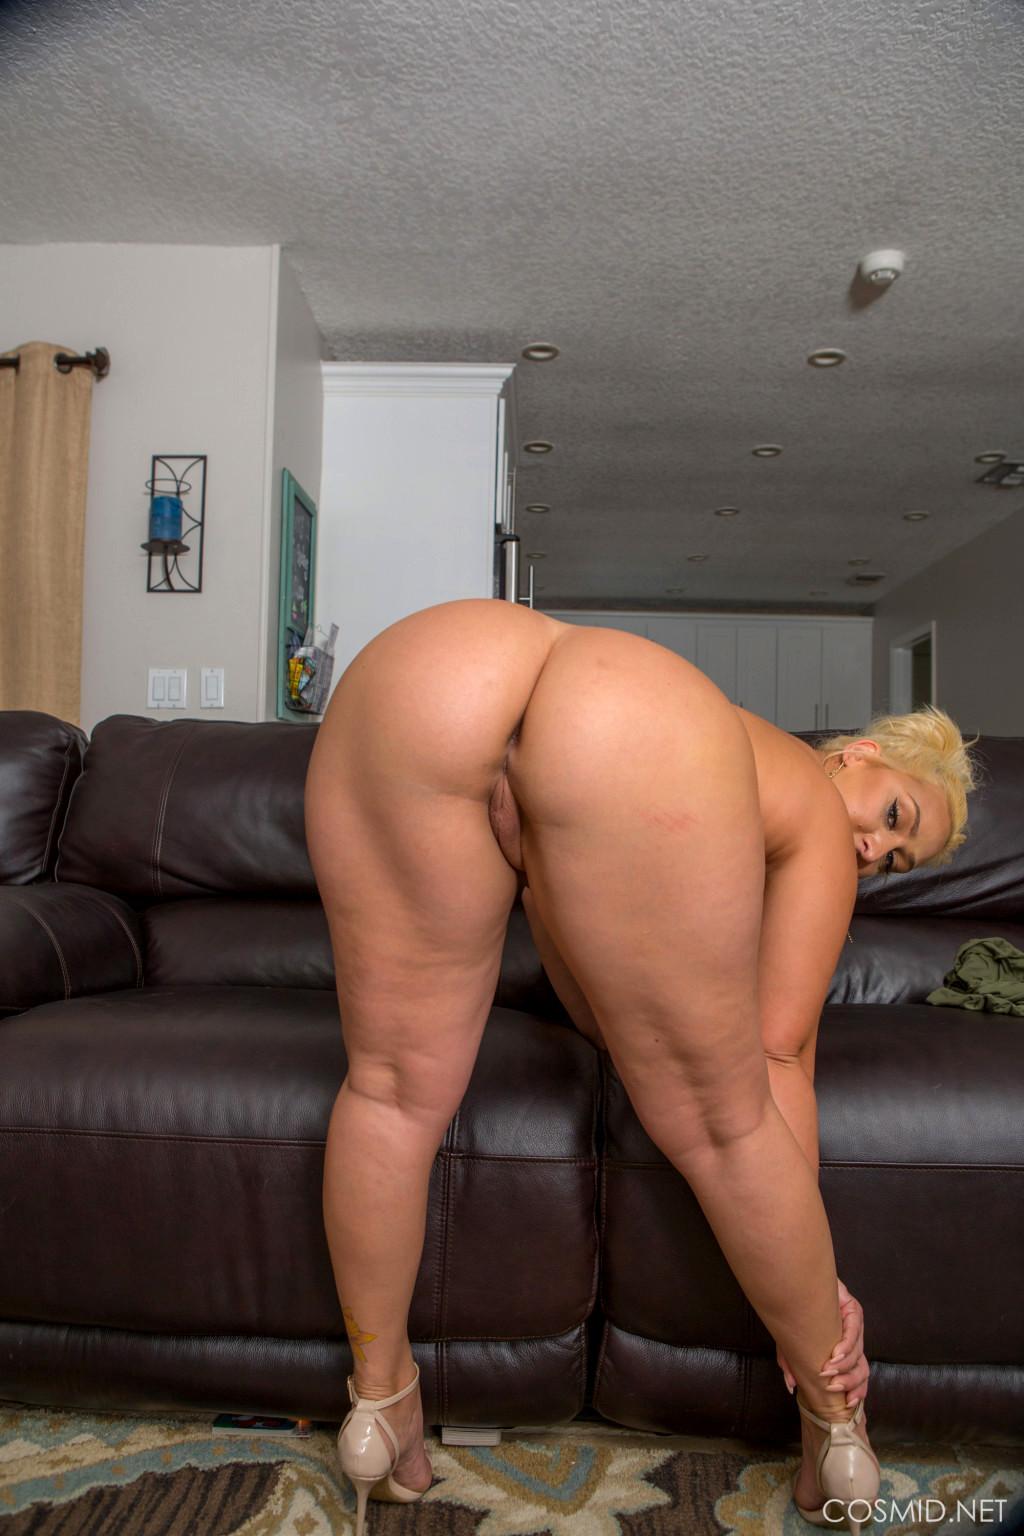 Sexy Booty Spre Porno Gallerier